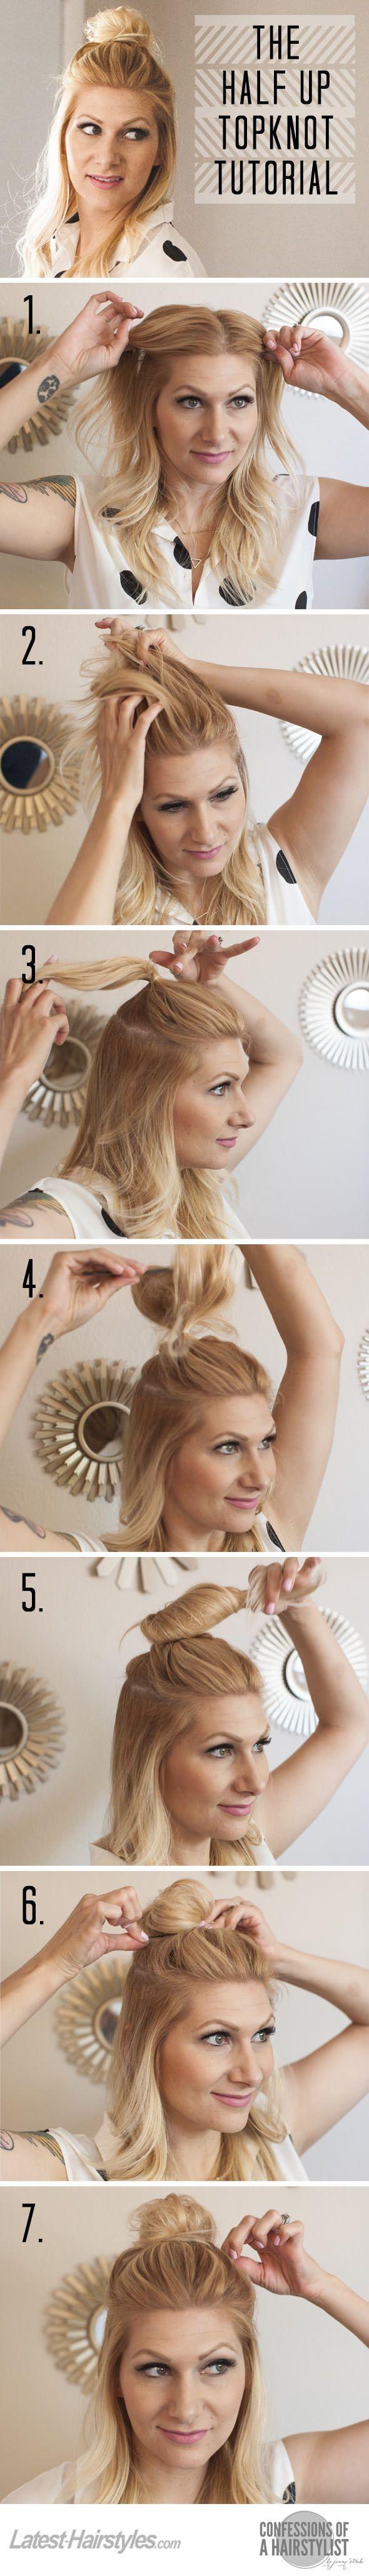 The Half Up Topknot Tutorial | Hair Tutorials | Pinterest | Topknot ...